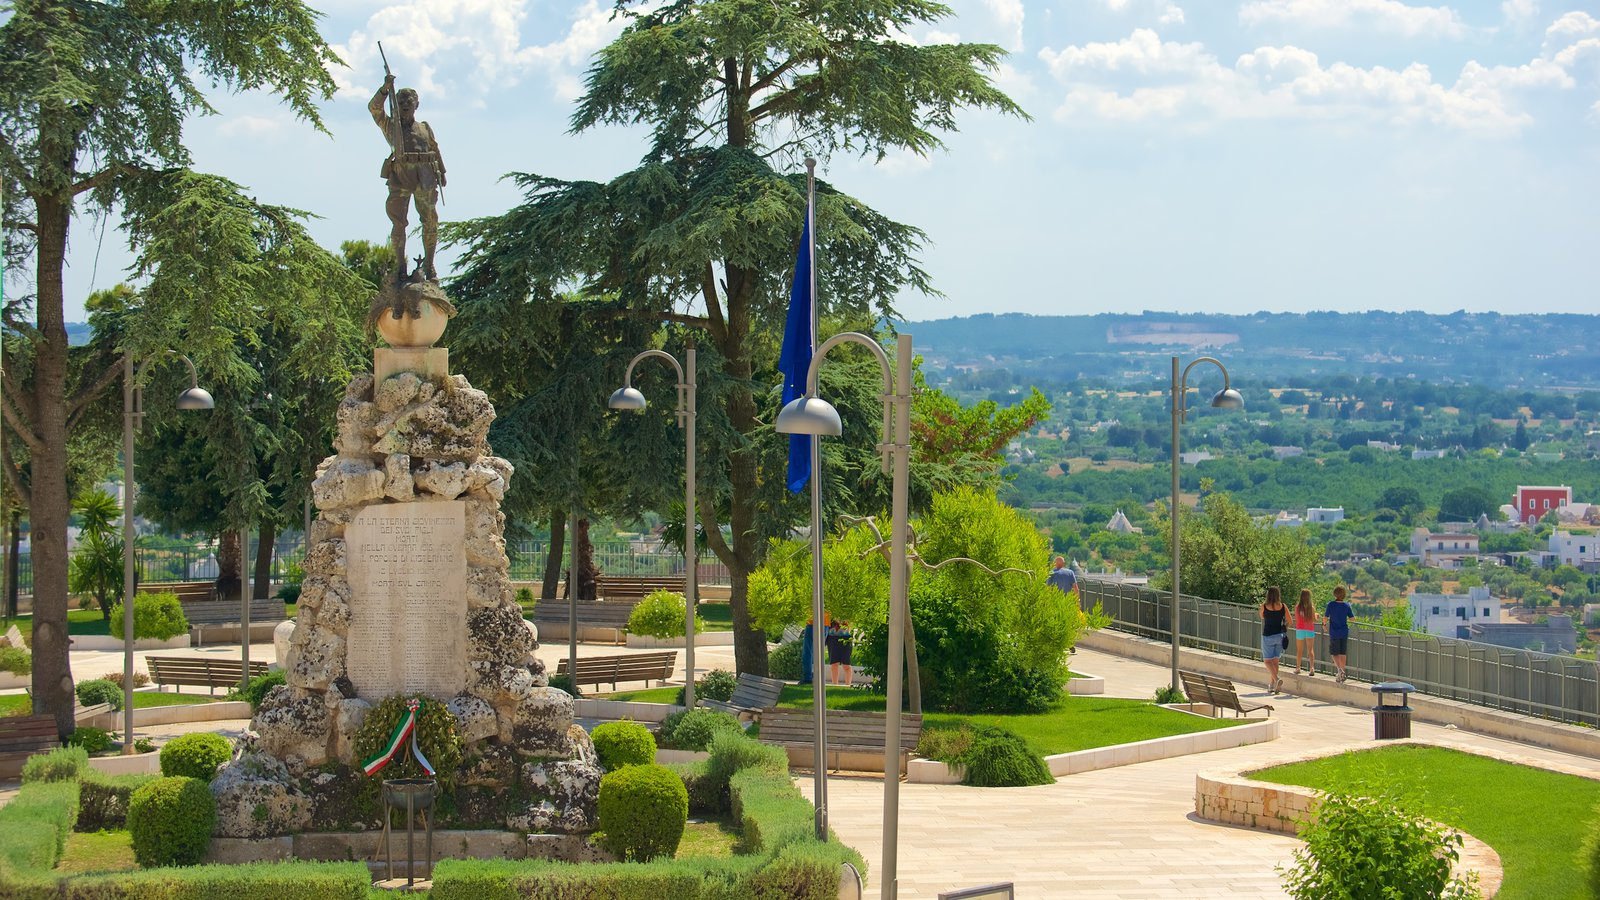 Brindisi which includes a garden